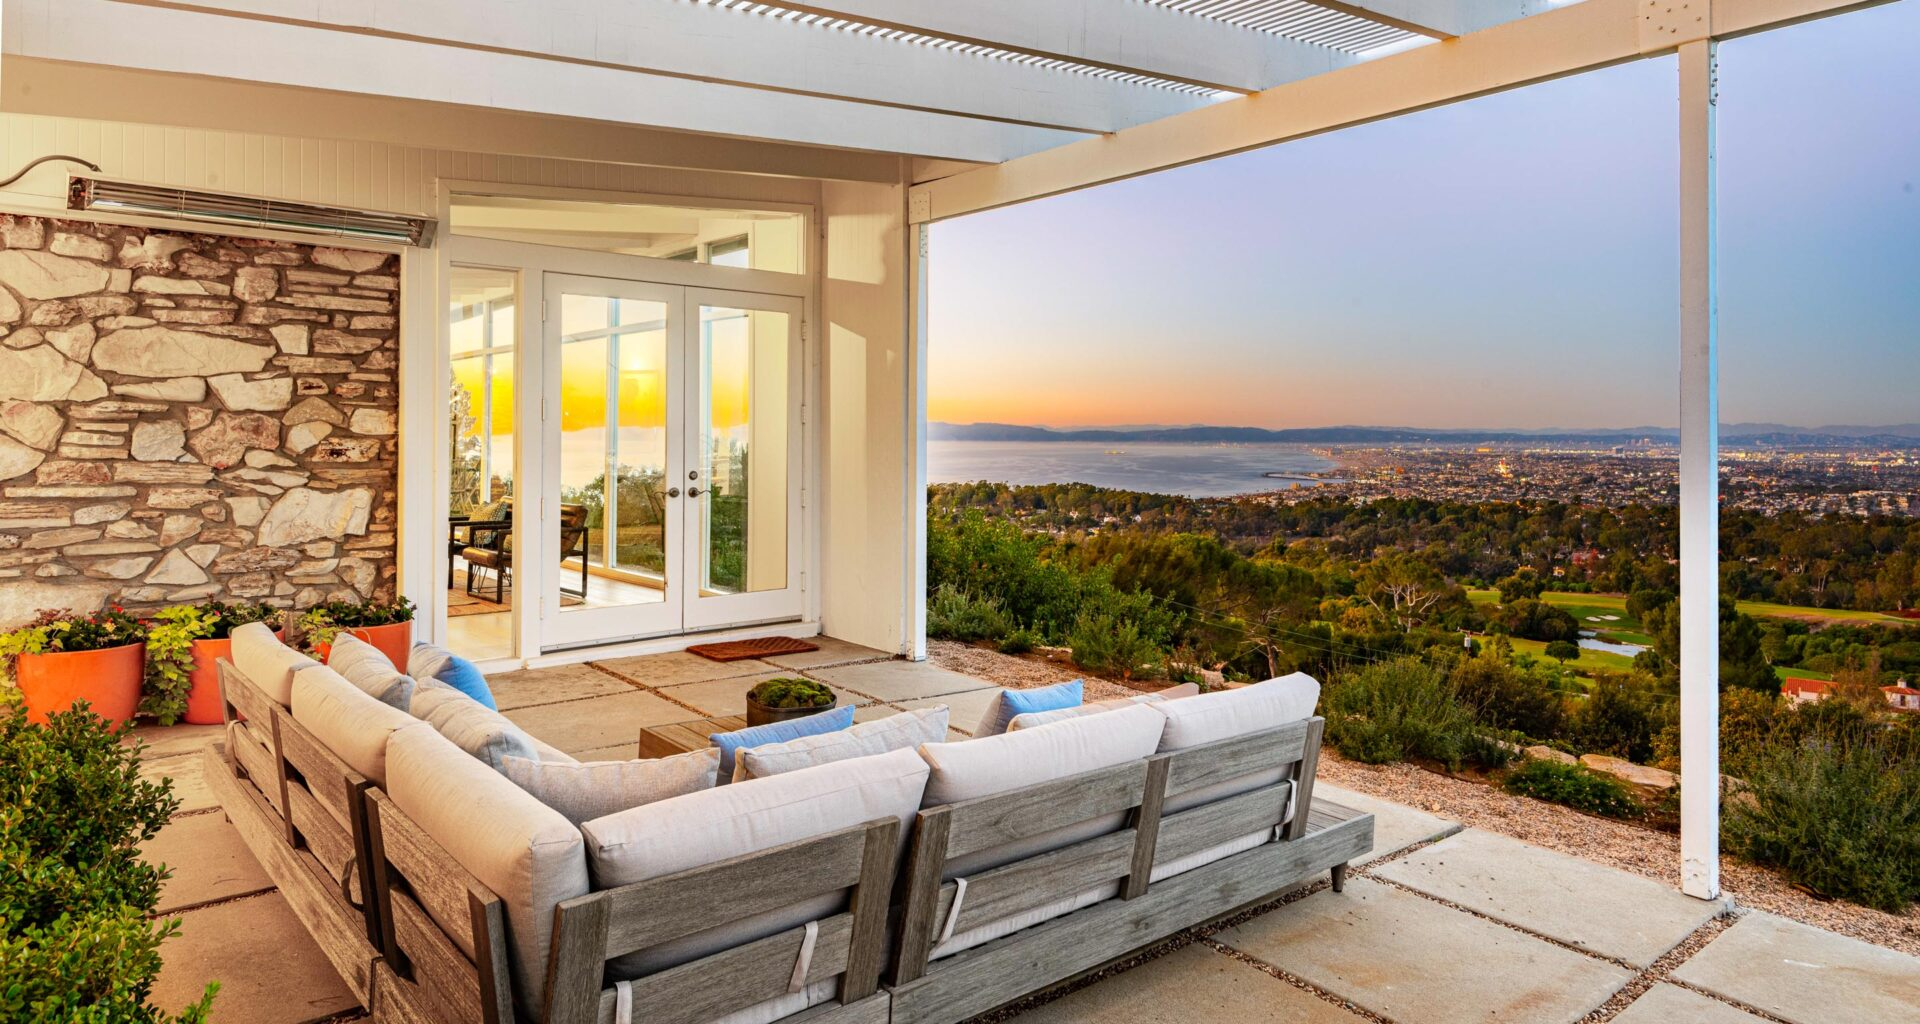 3330 via Campesina, Rancho Palos Verdes, 90275, home for sale, real estate, queen's necklace, Chris Adlam, Vista Sotheby's, Vista Sotheby's International Realty